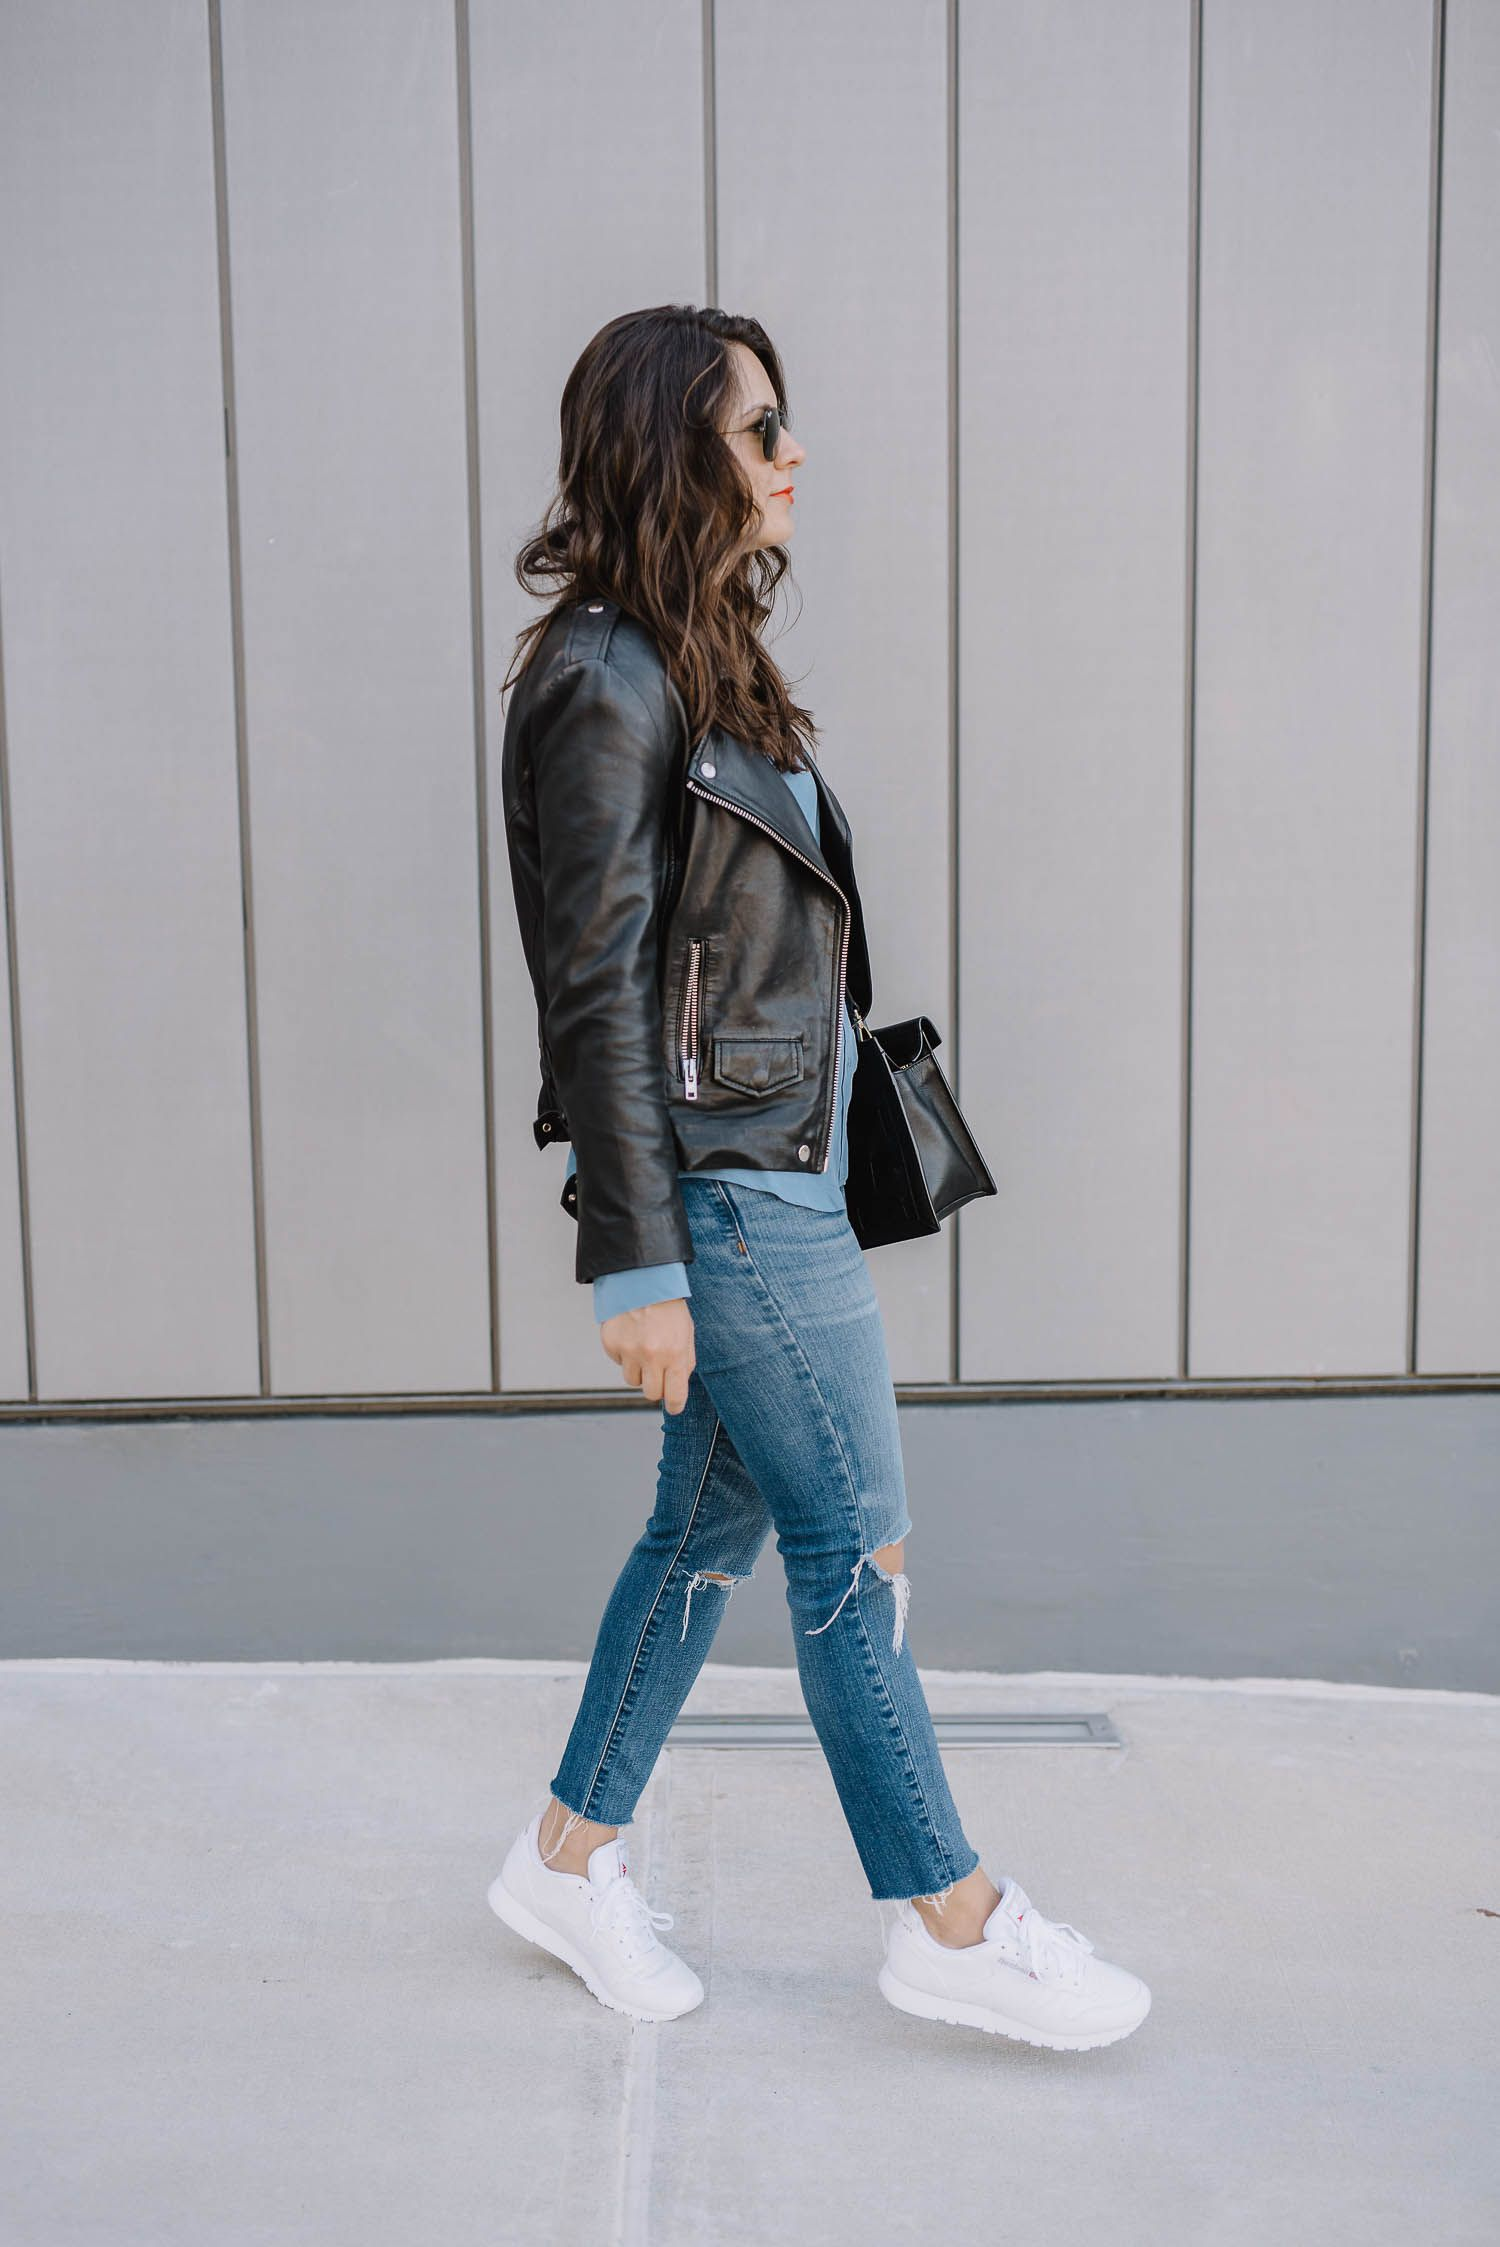 How To Style Reebok Classics Like A Fashion Blogger